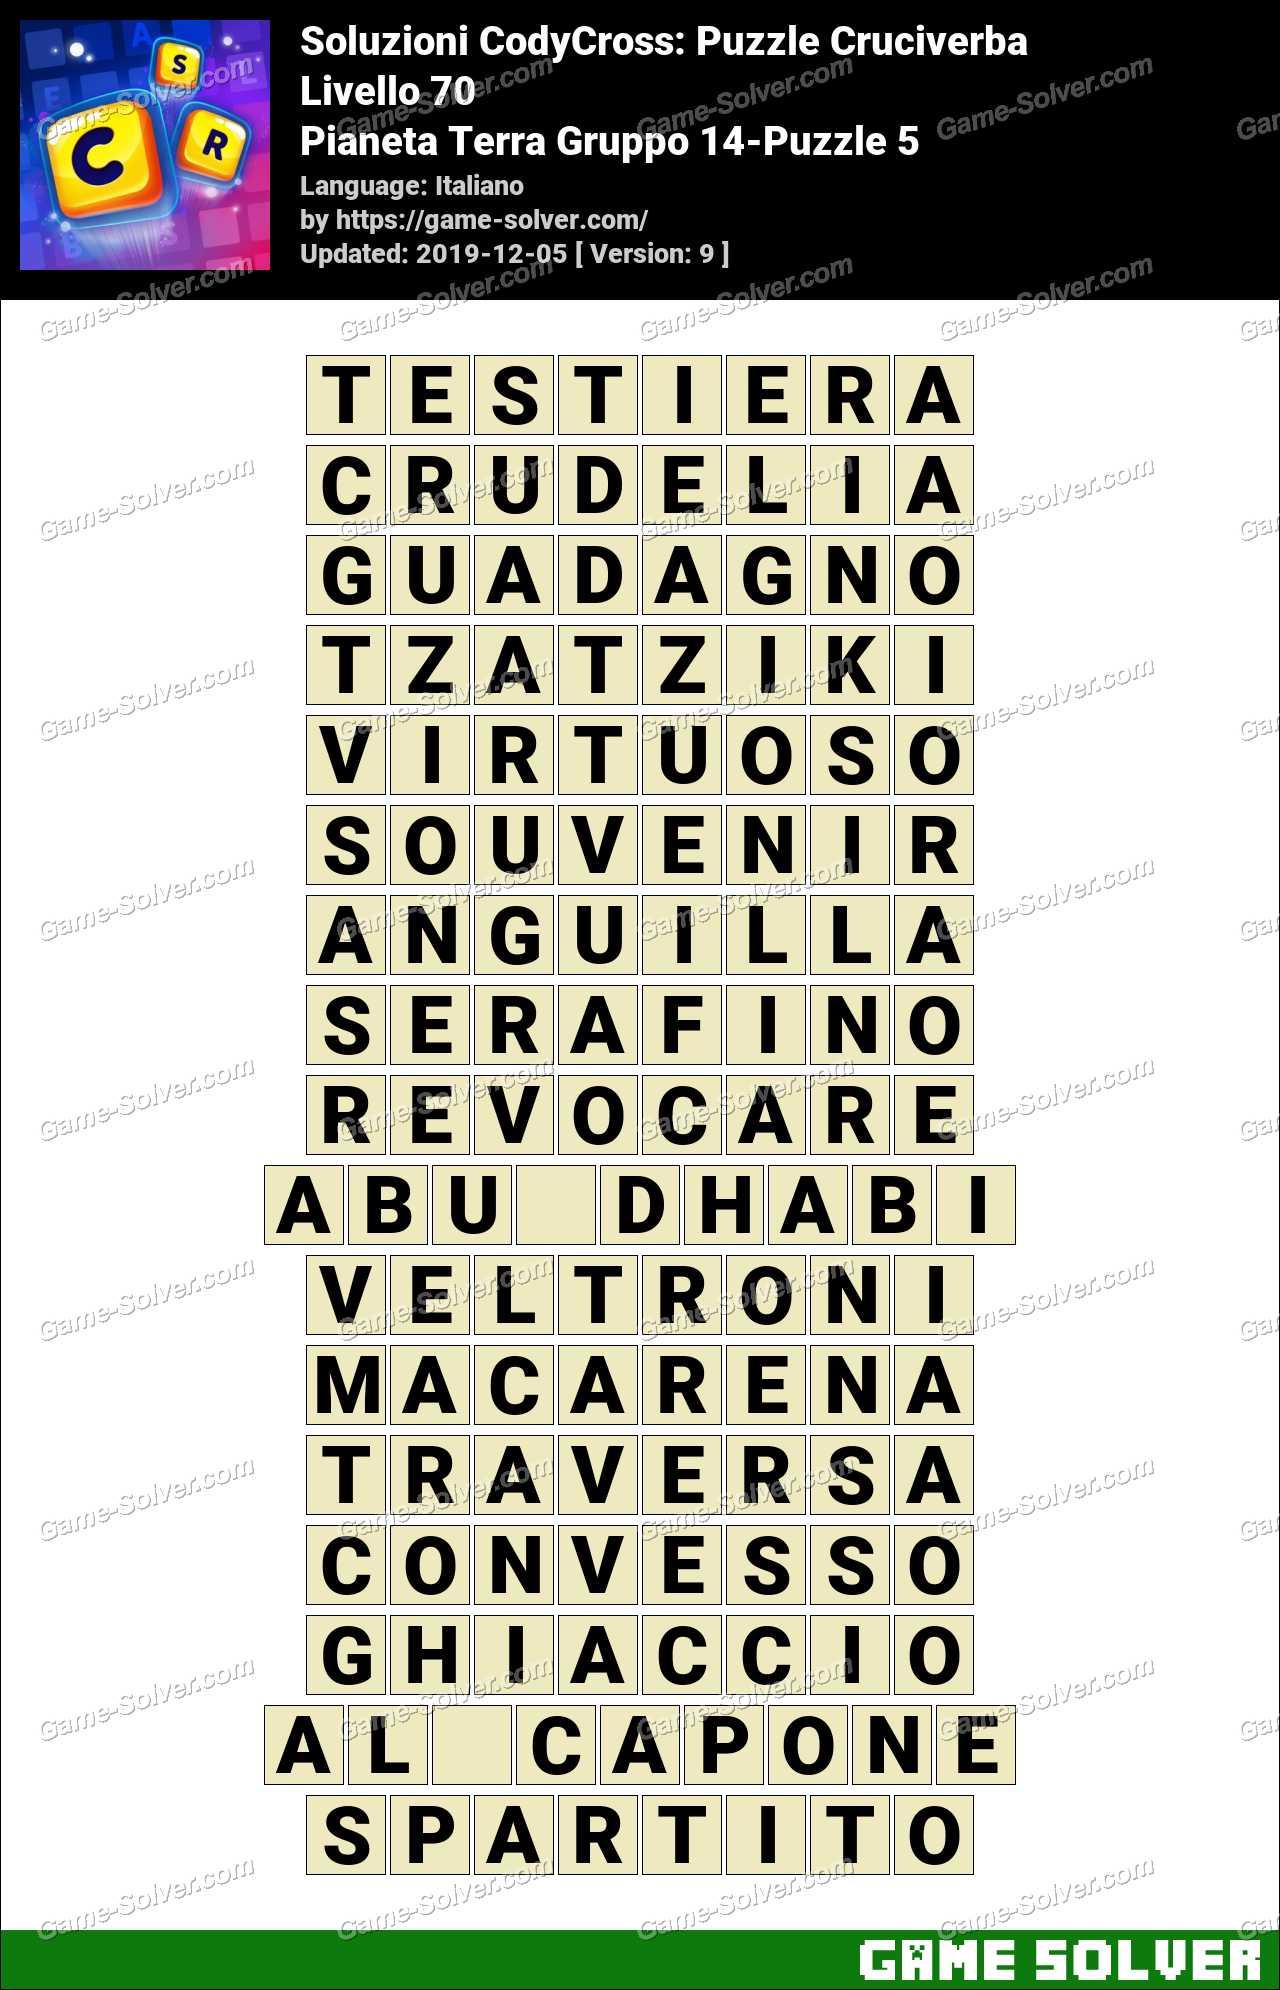 Soluzioni CodyCross Pianeta Terra Gruppo 14-Puzzle 5